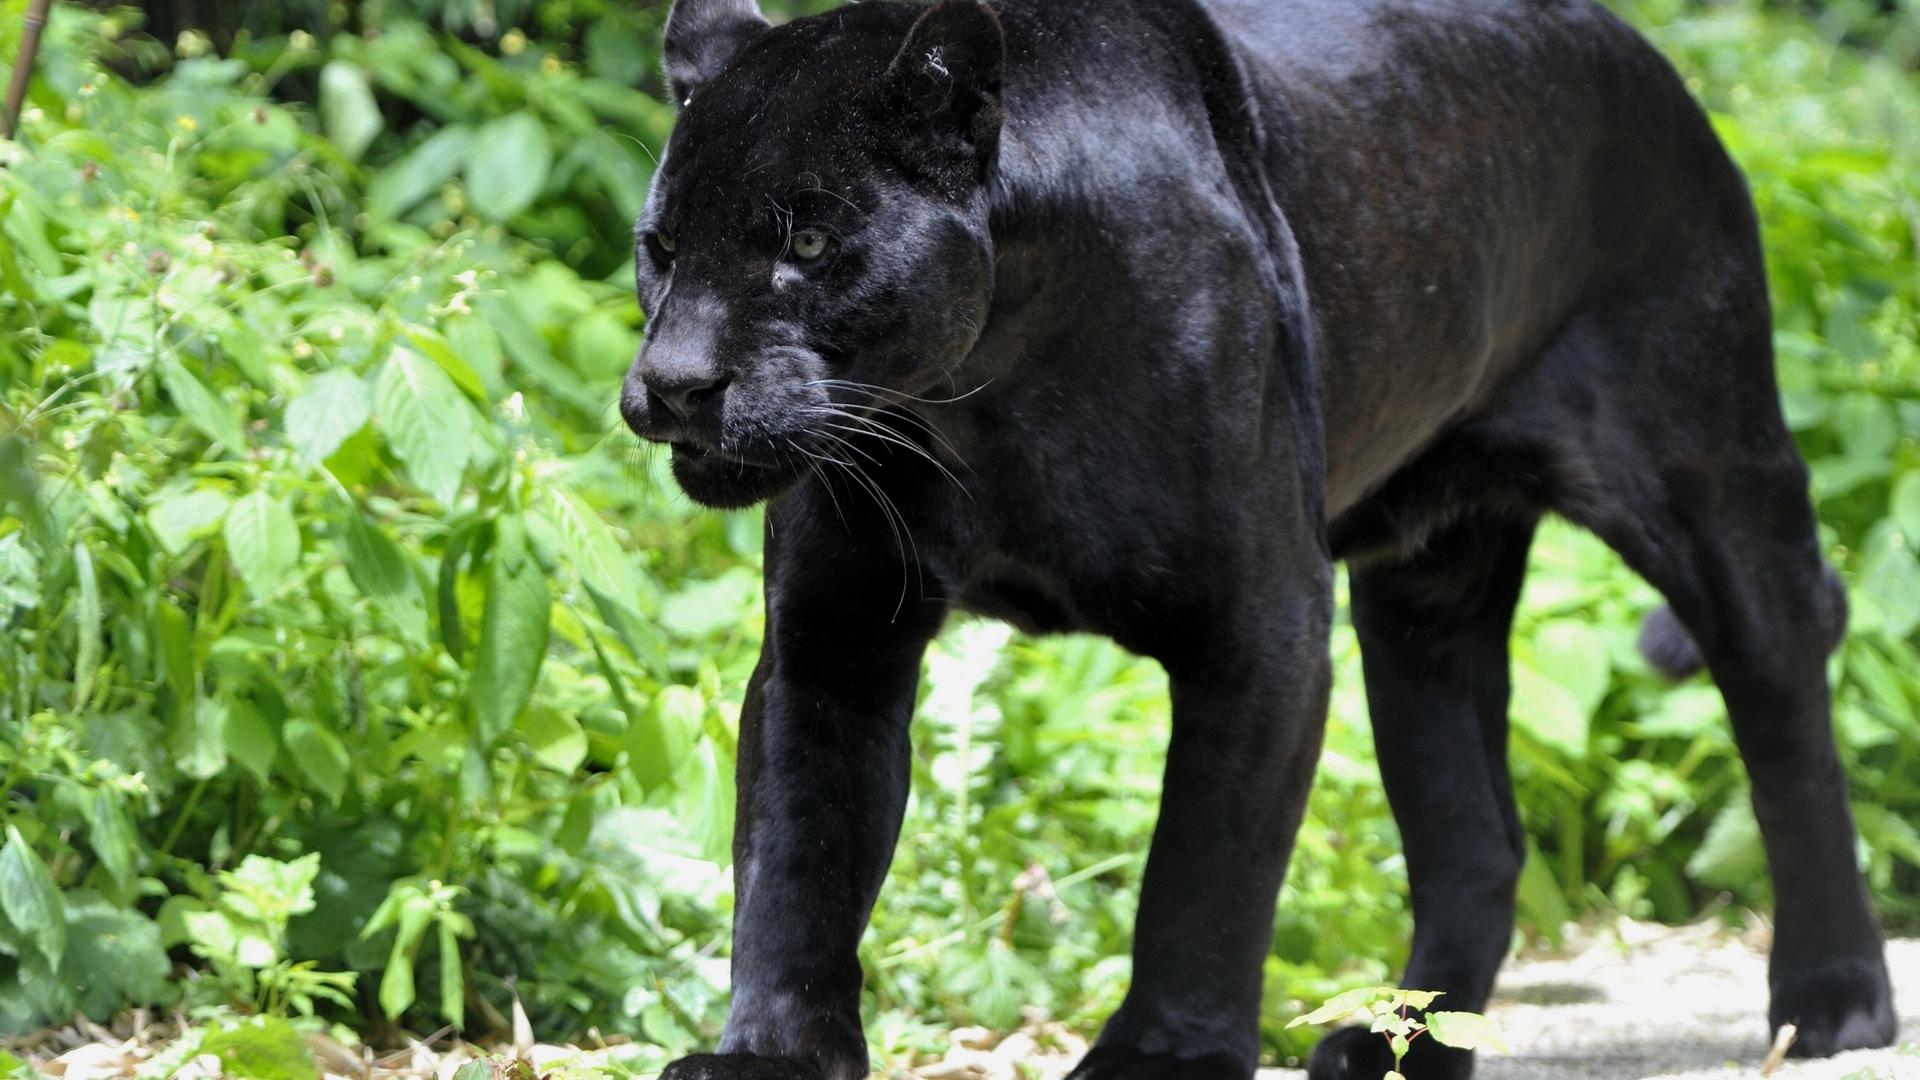 Black Panther Wallpaper 752756 Black Panther Wallpaper 752780 Black 1920x1080